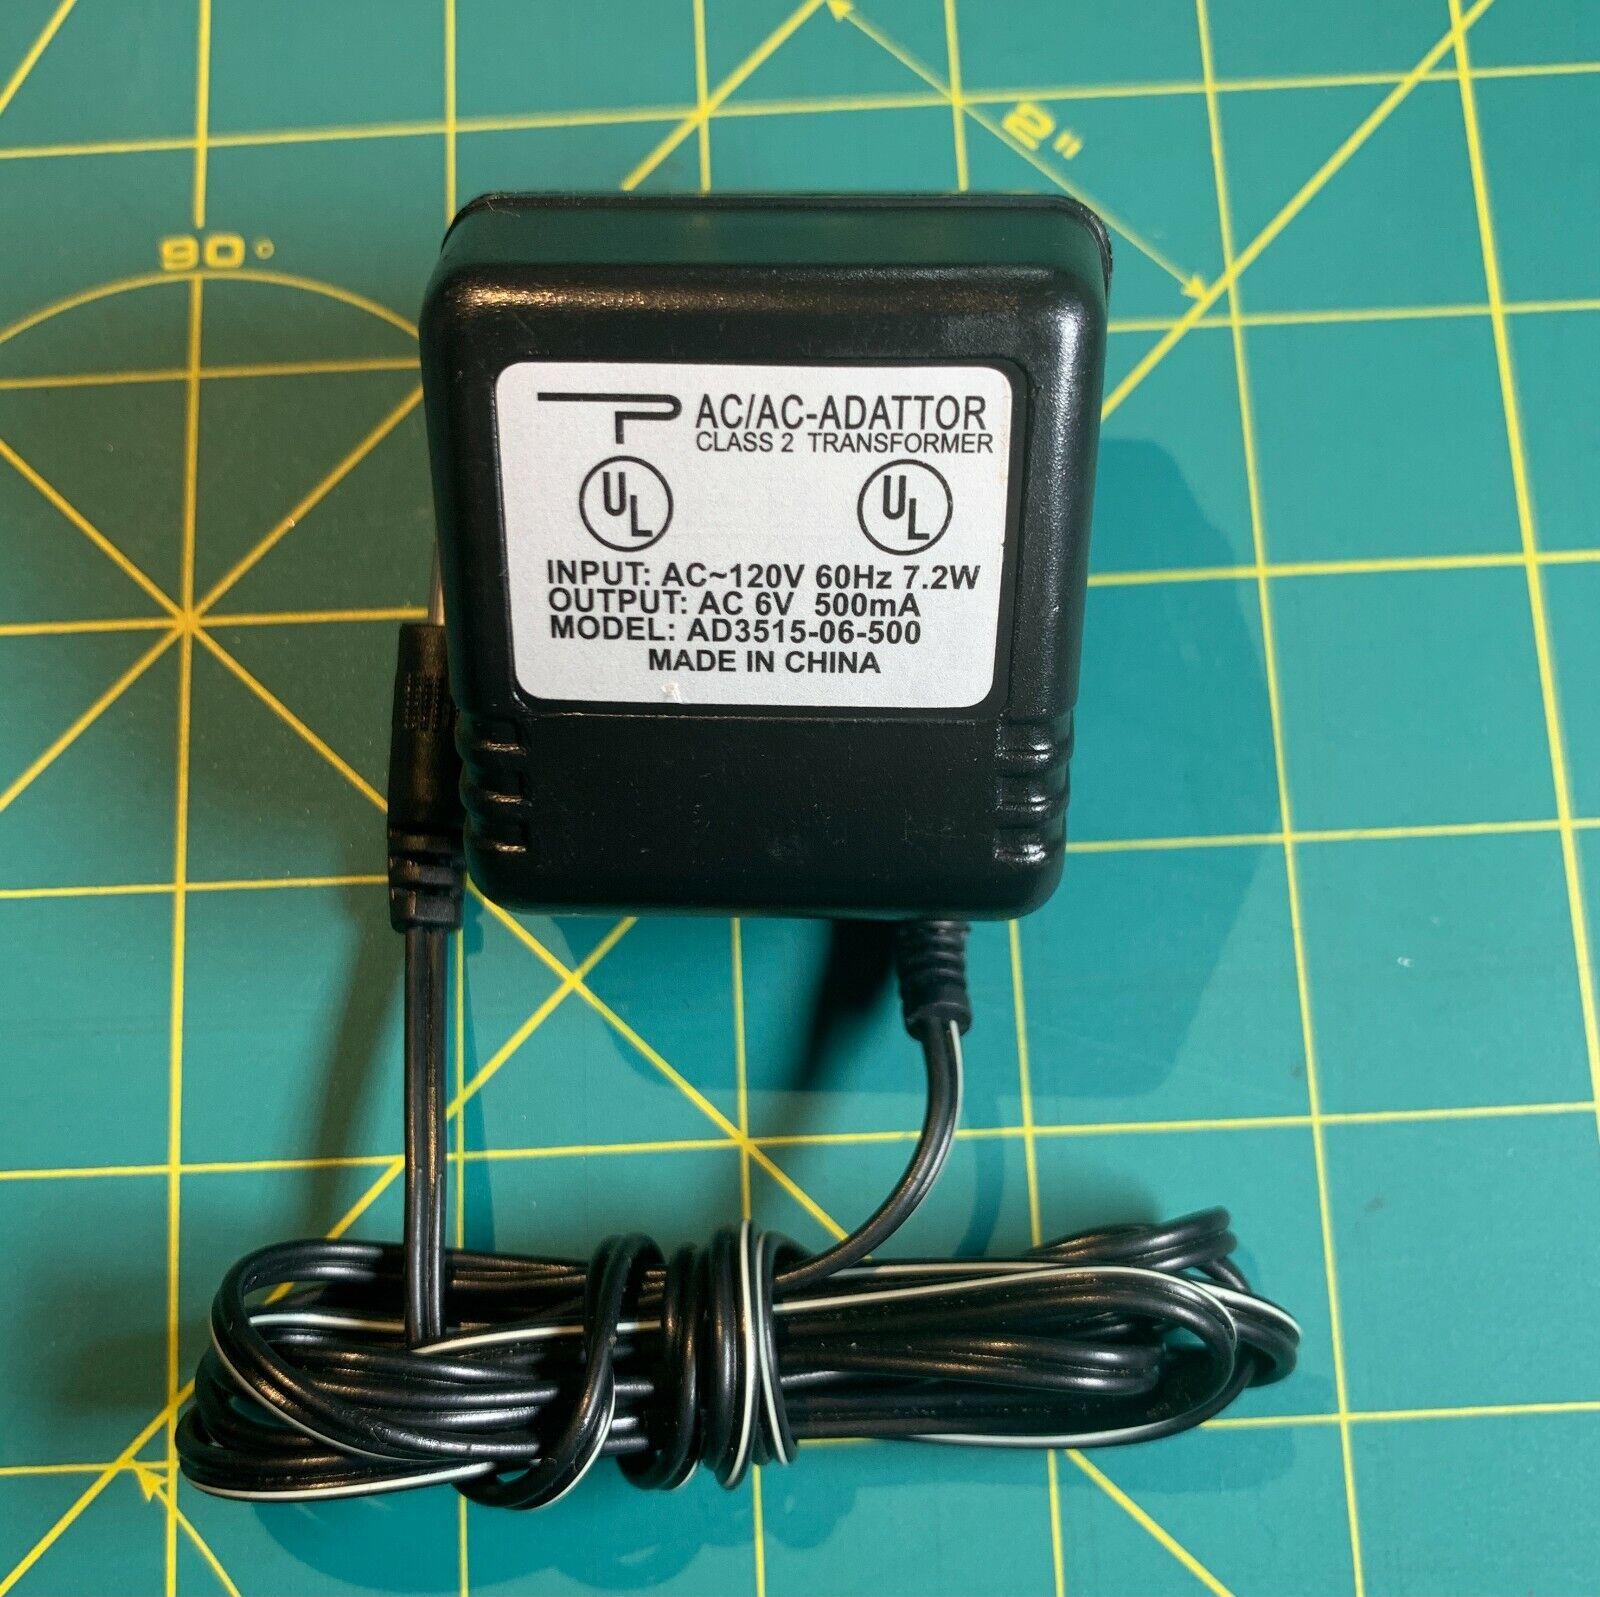 AC/AC Adapter AD3515-06-500 Power Supply Adaptor 6V ~ 500mA Class 2 Transformer